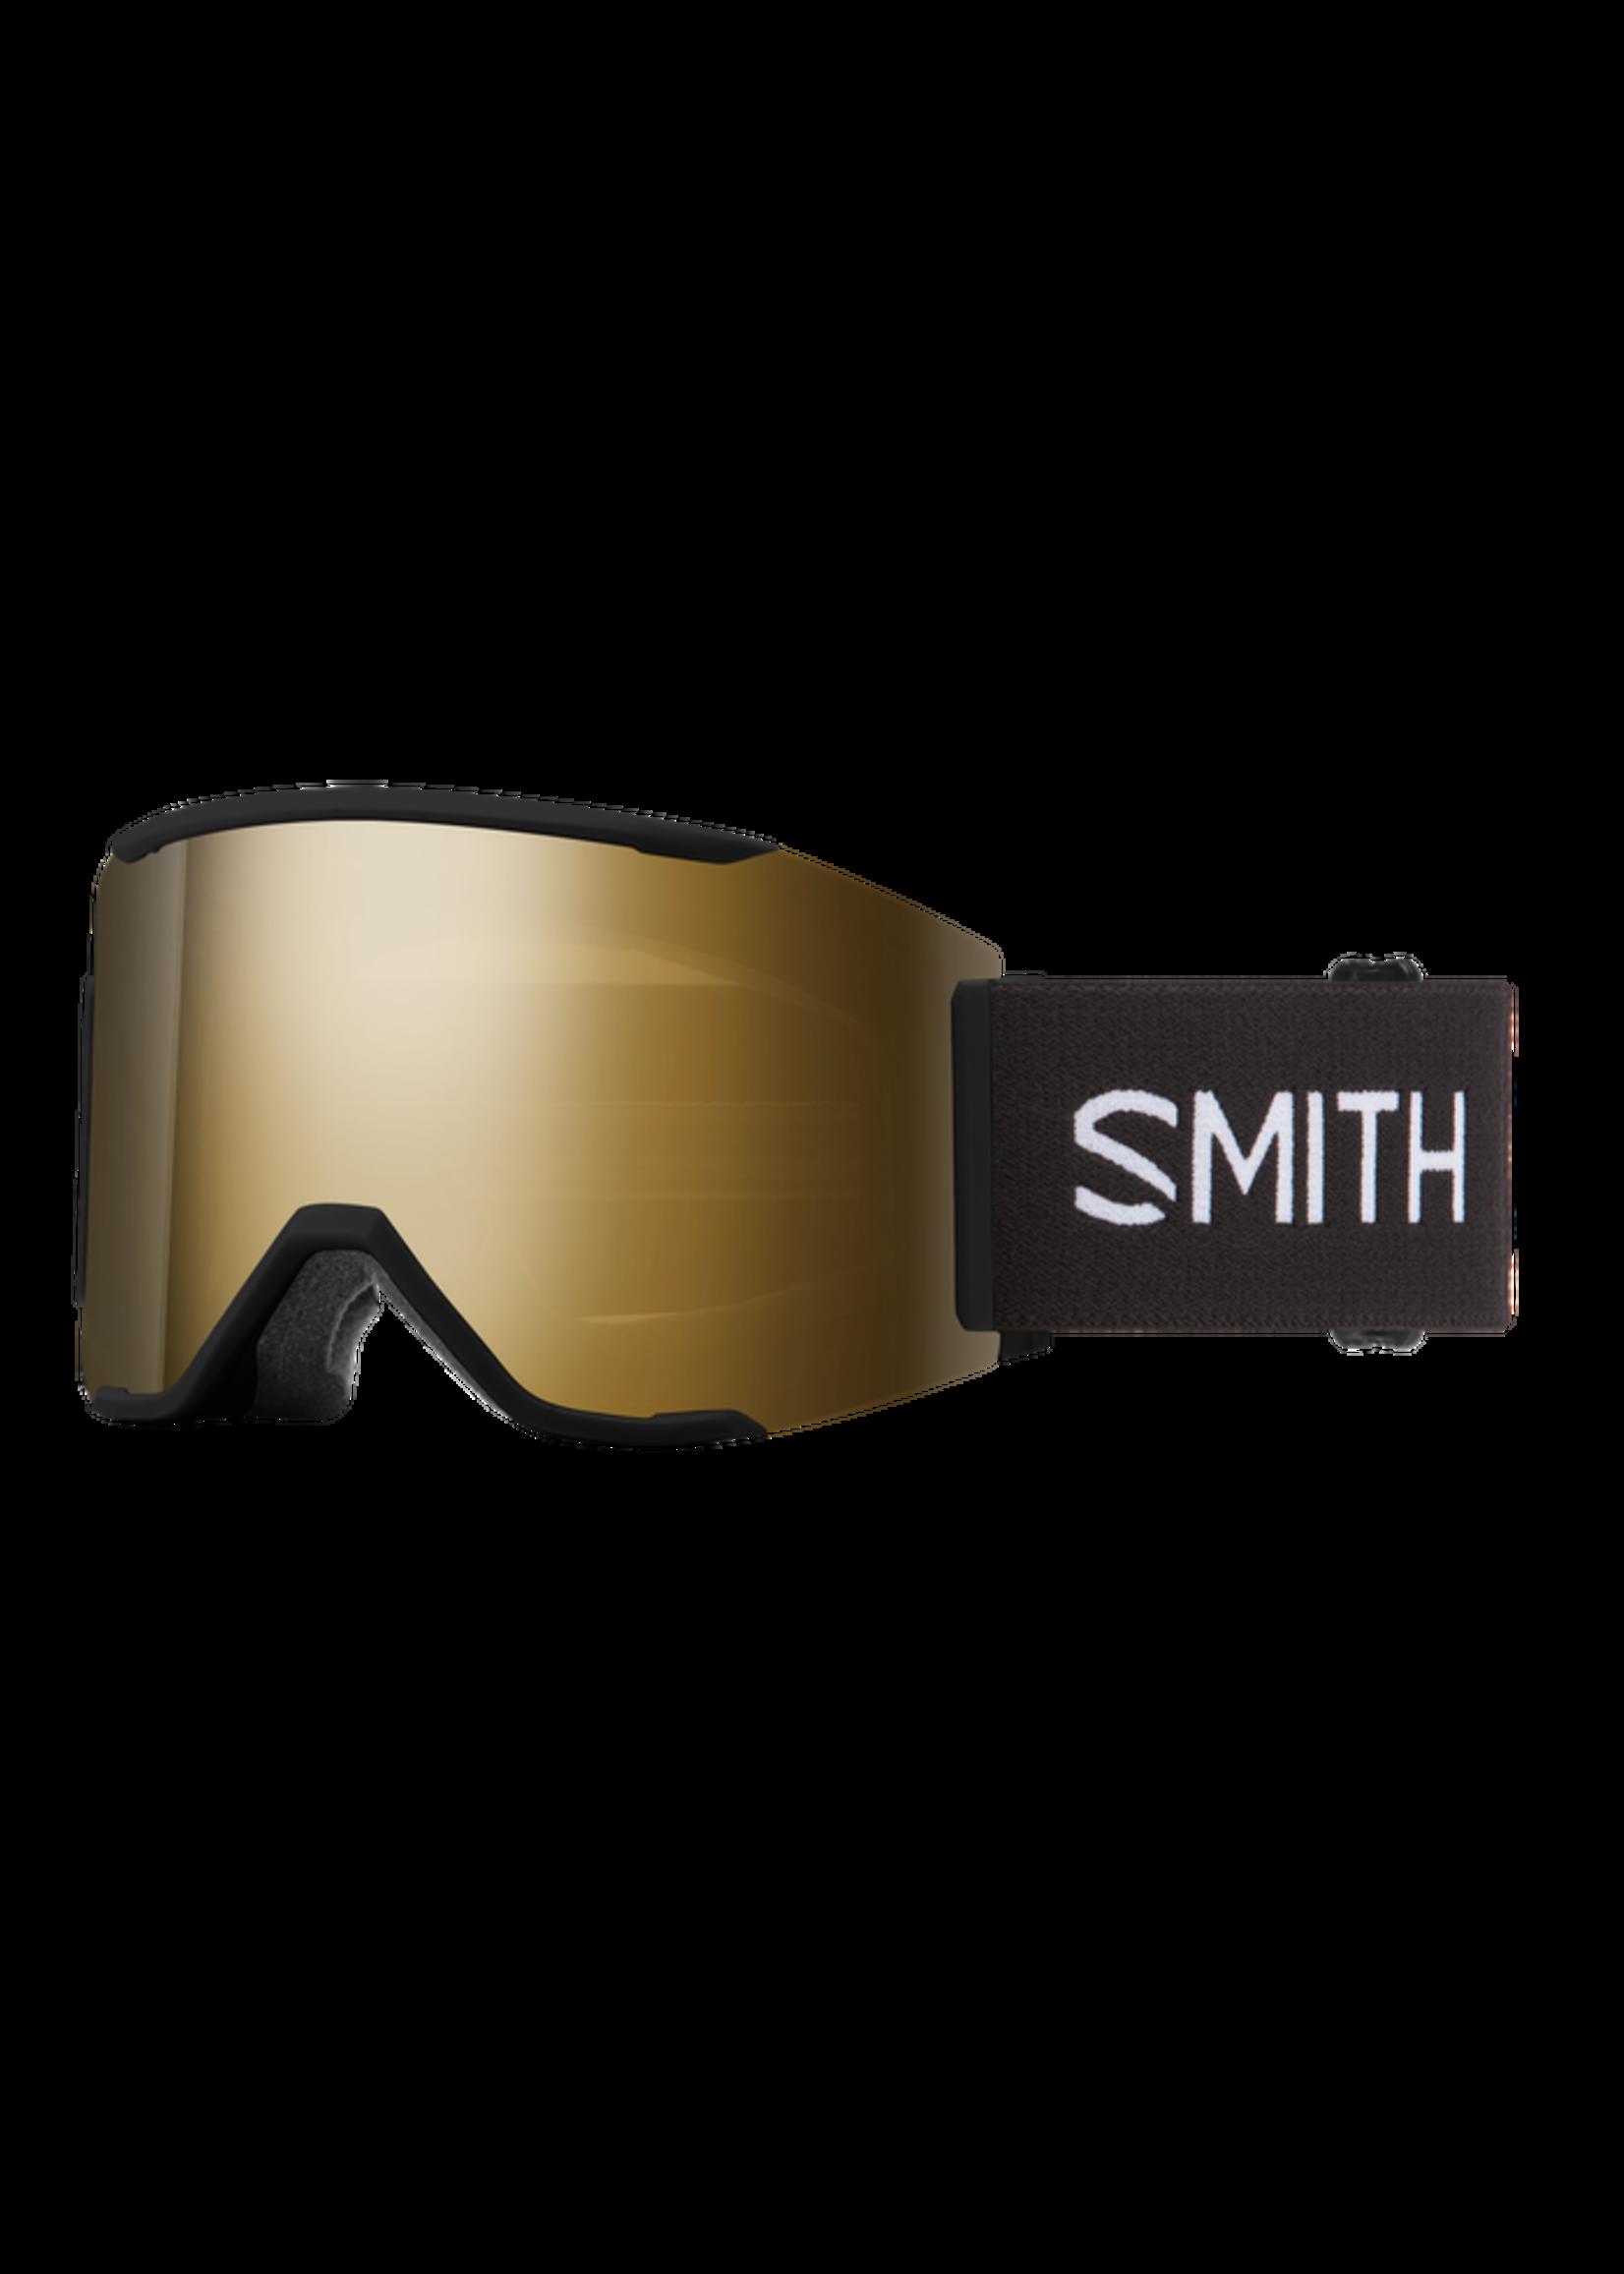 smith Smith Squad Mag Goggle